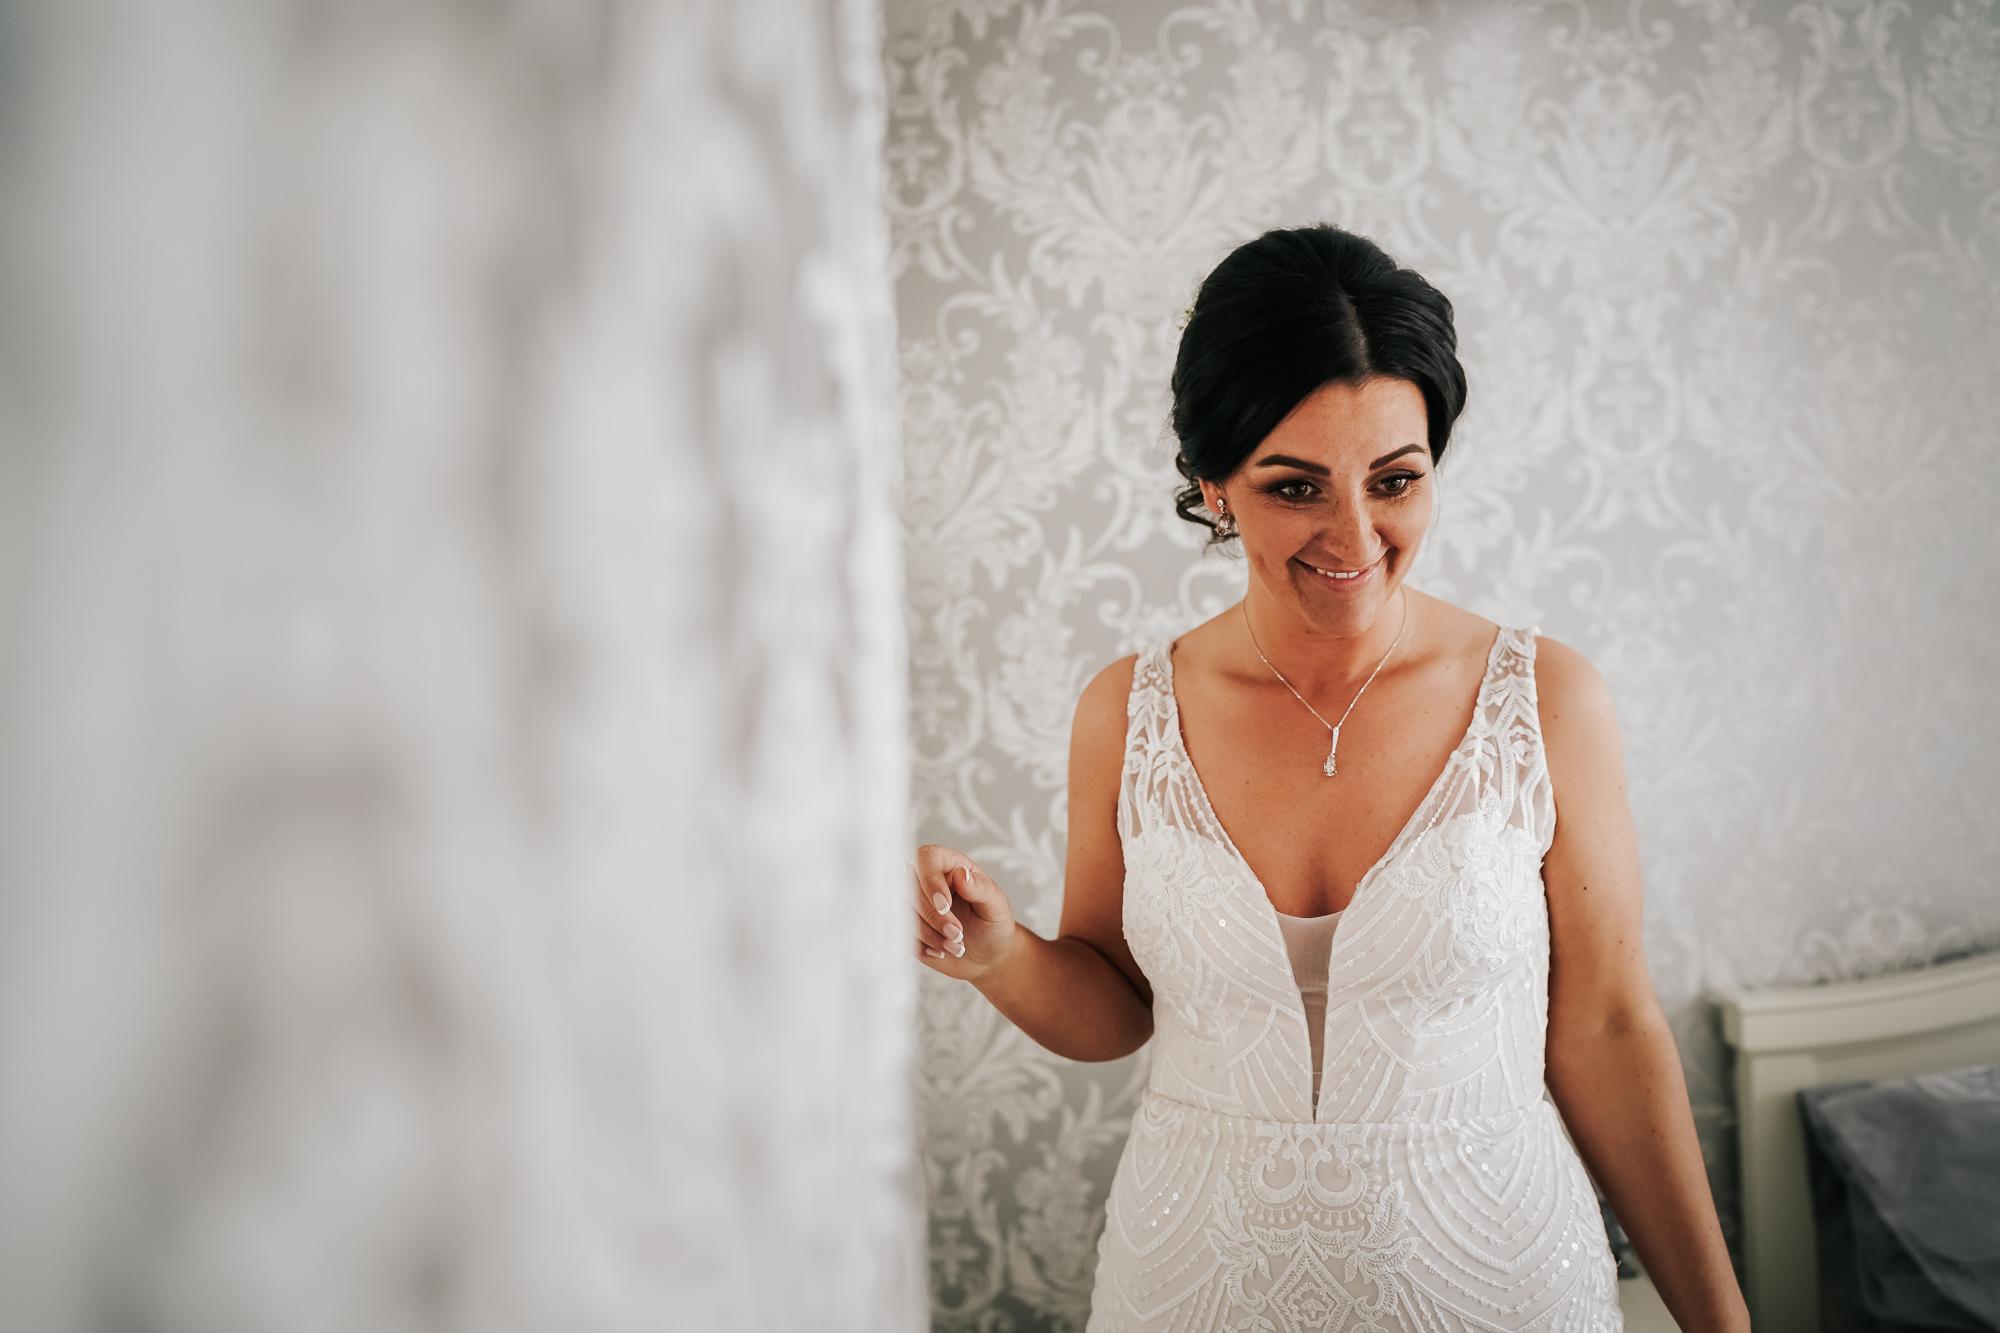 The Hayloft Wedding Photography Cheshire wedding photographer (12 of 52).jpg